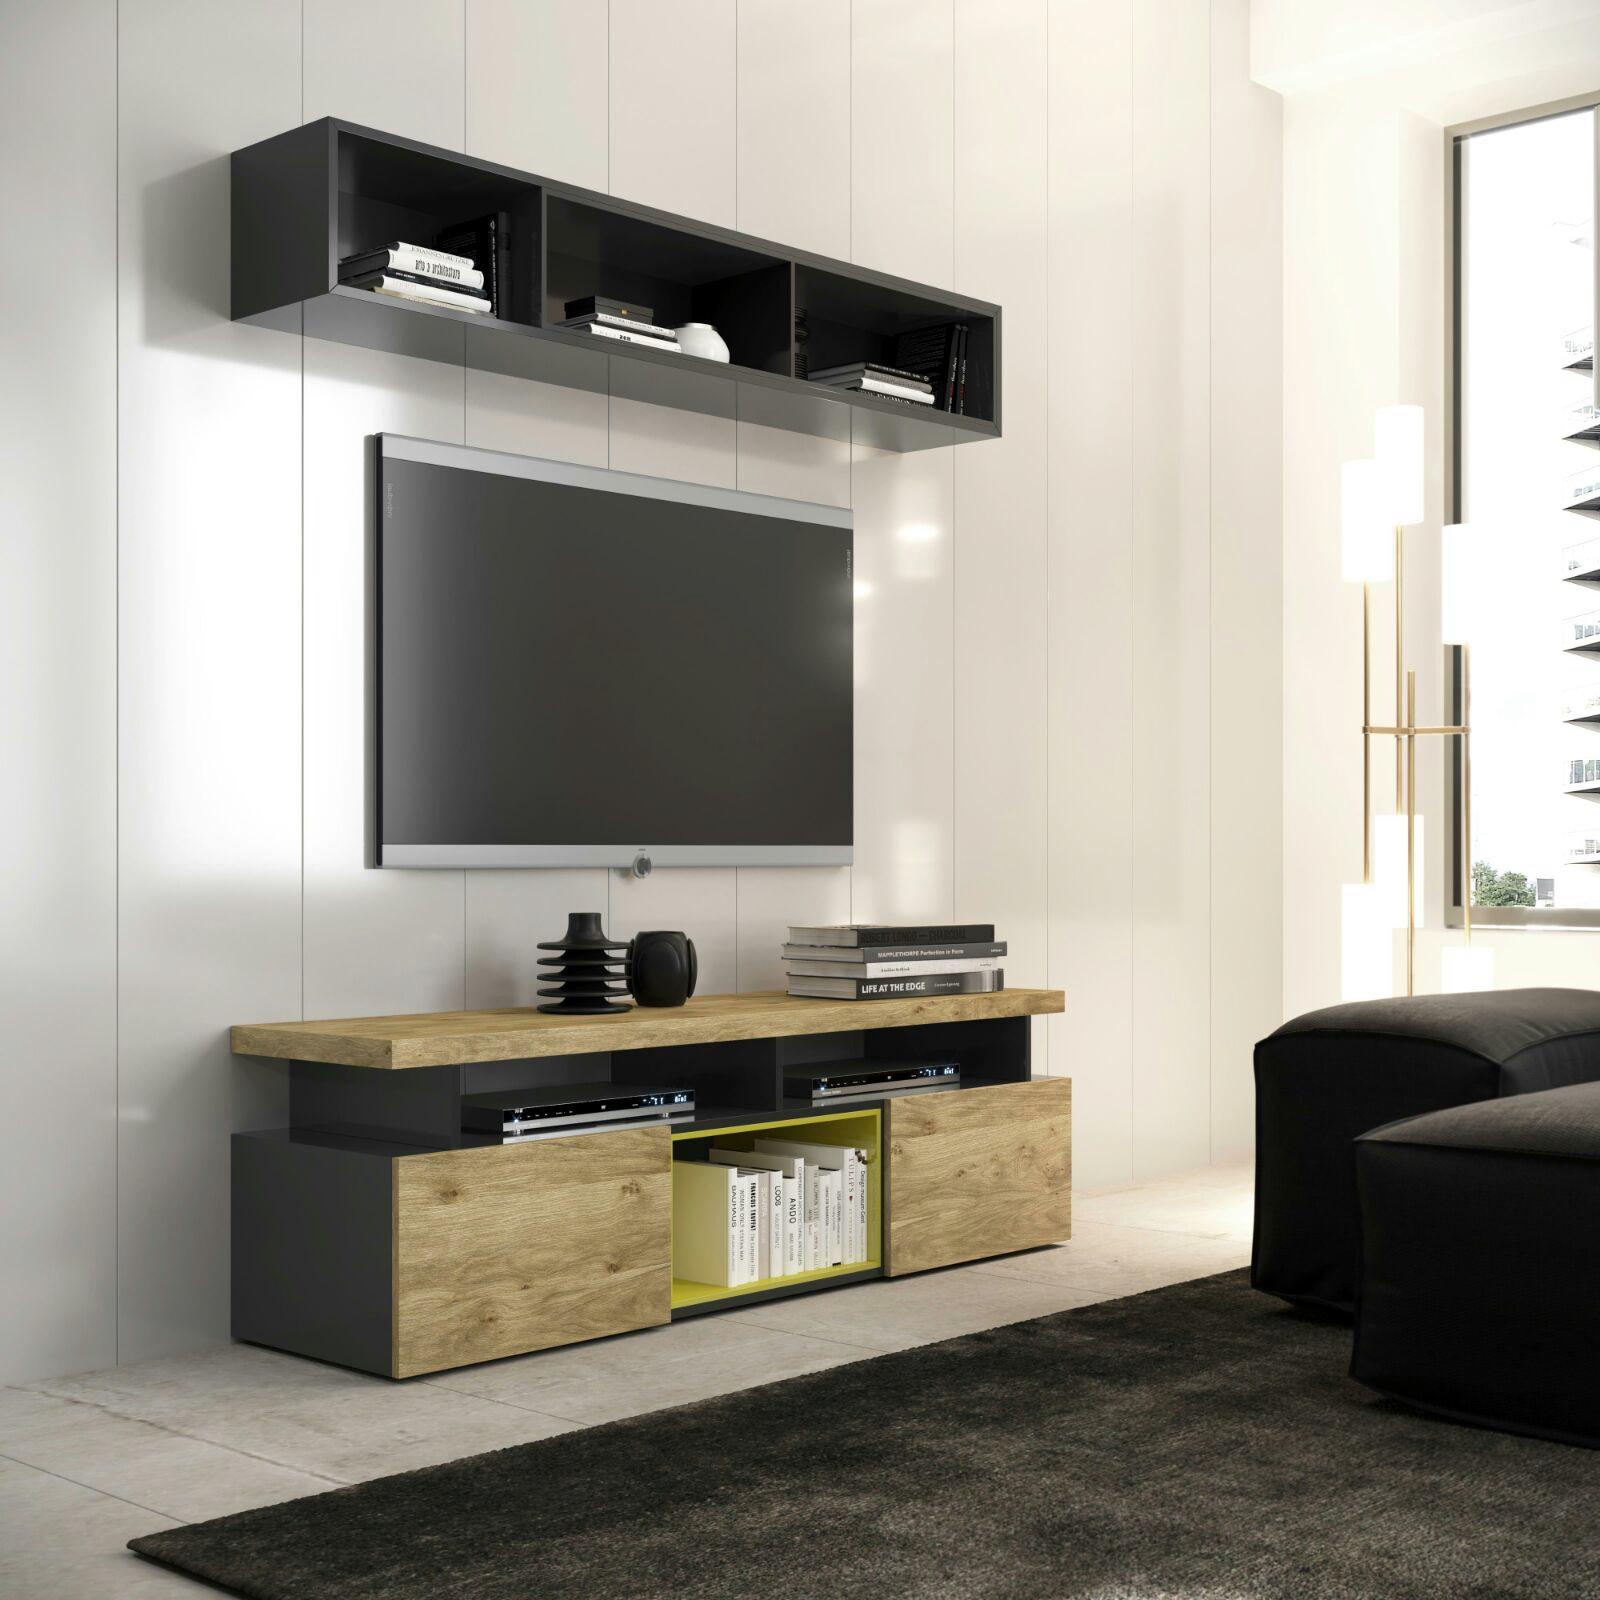 Mesa tv modelo chan muebles d azmuebles d az for Mesas de televisor modernas